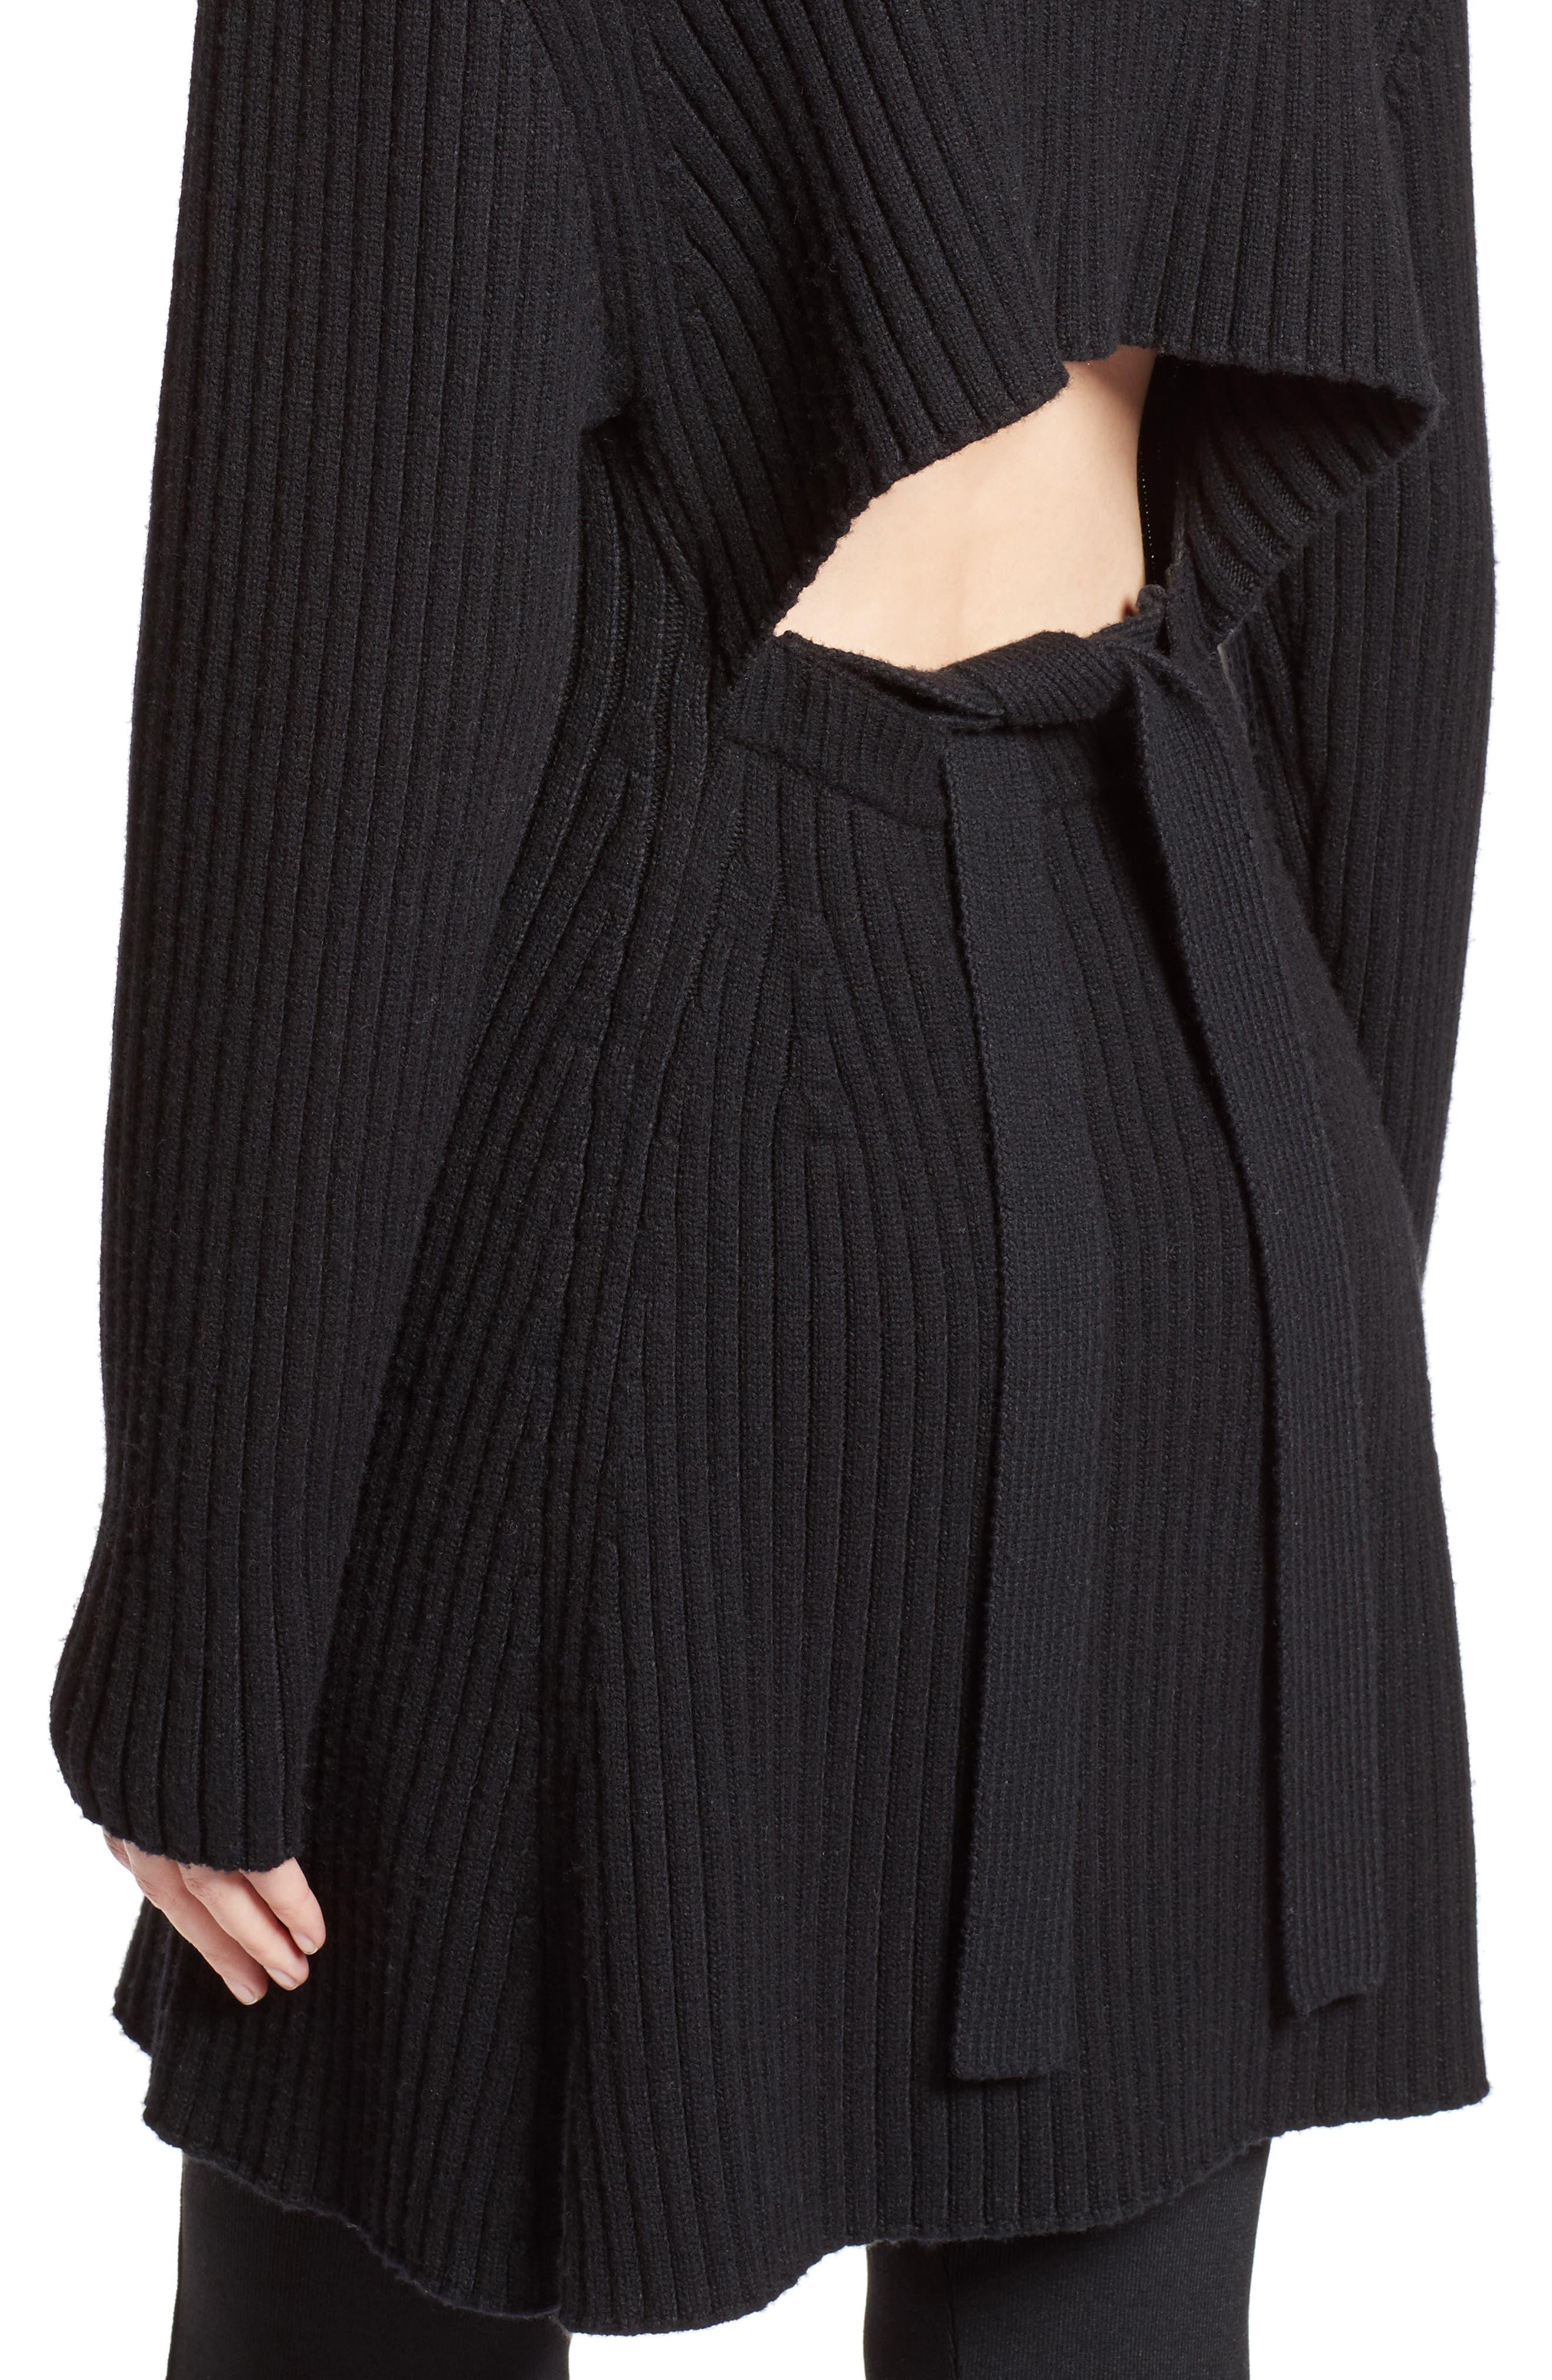 Wool & Cashmere Blend Turtleneck Dress,                             Alternate thumbnail 4, color,                             001